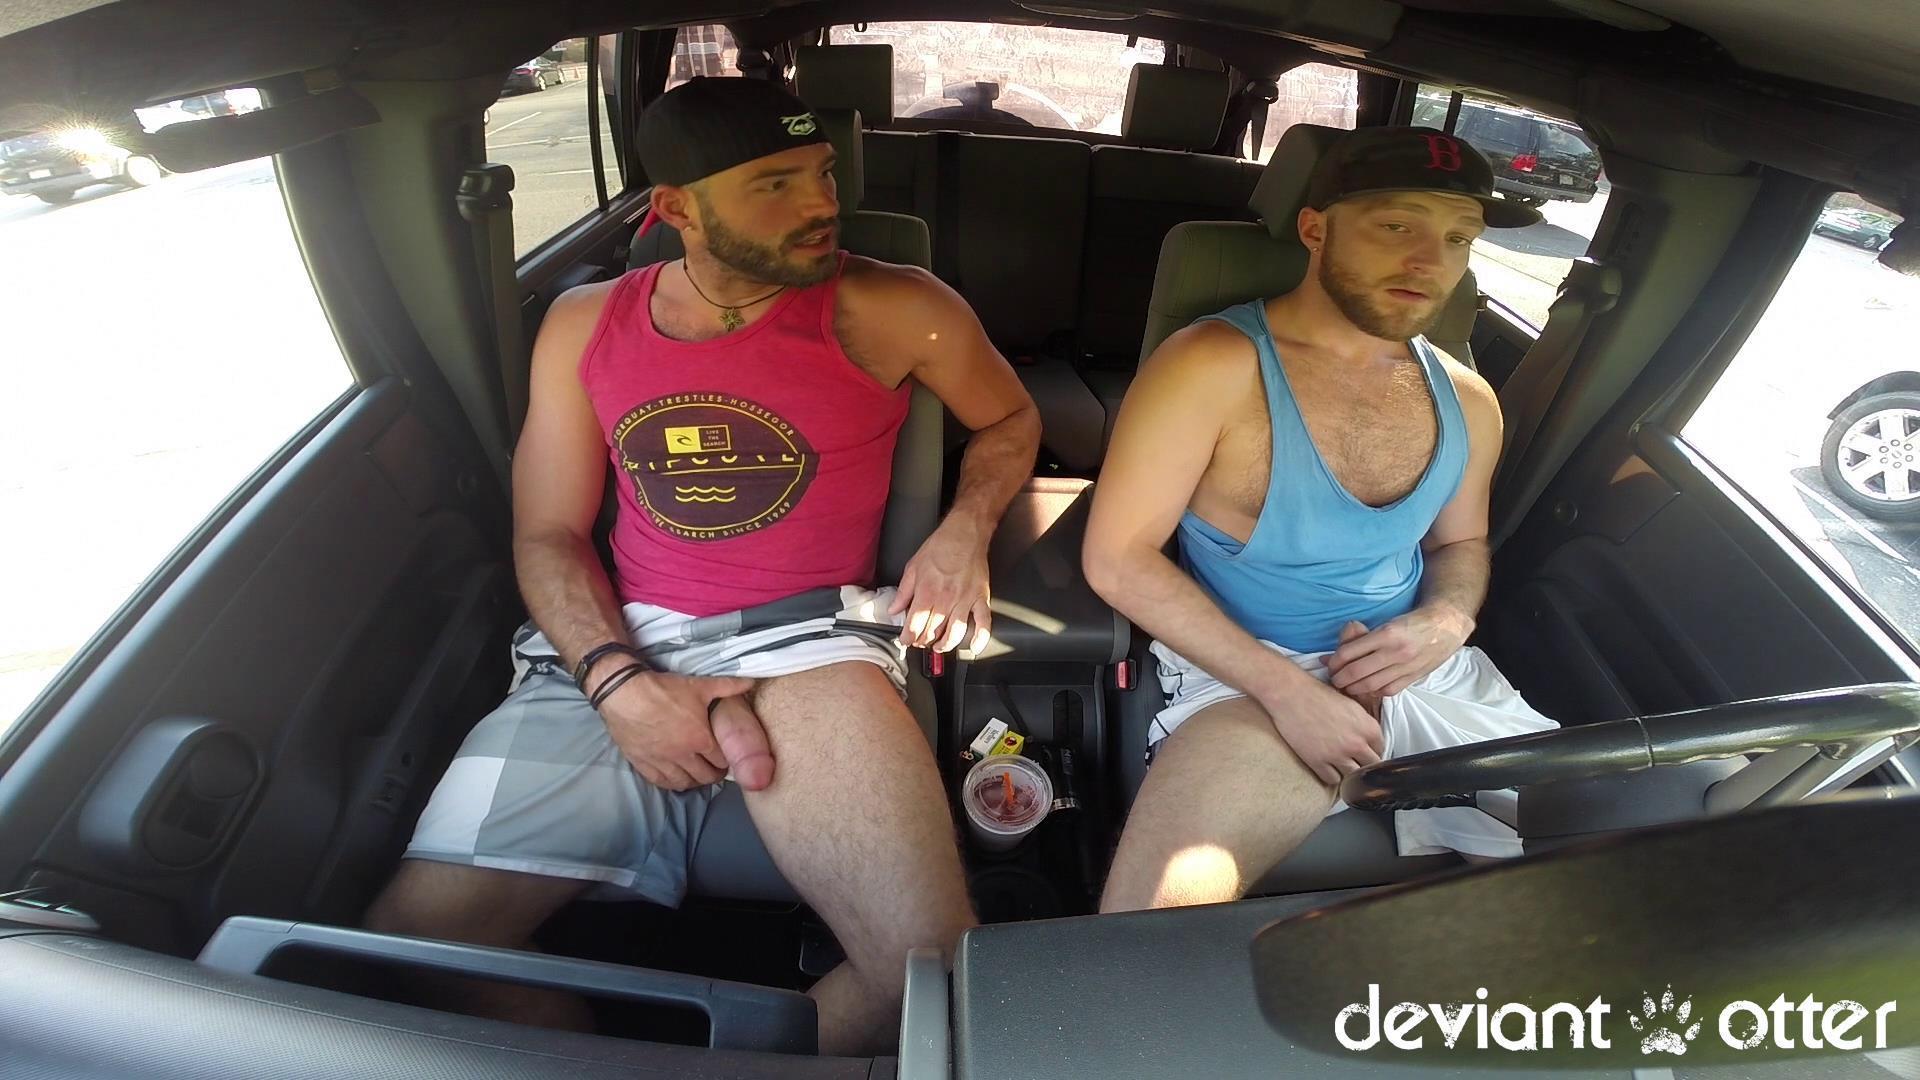 Deviant Otter Xavier Sucking Cock In Public Hairy Guys Amateur Gay Porn 03